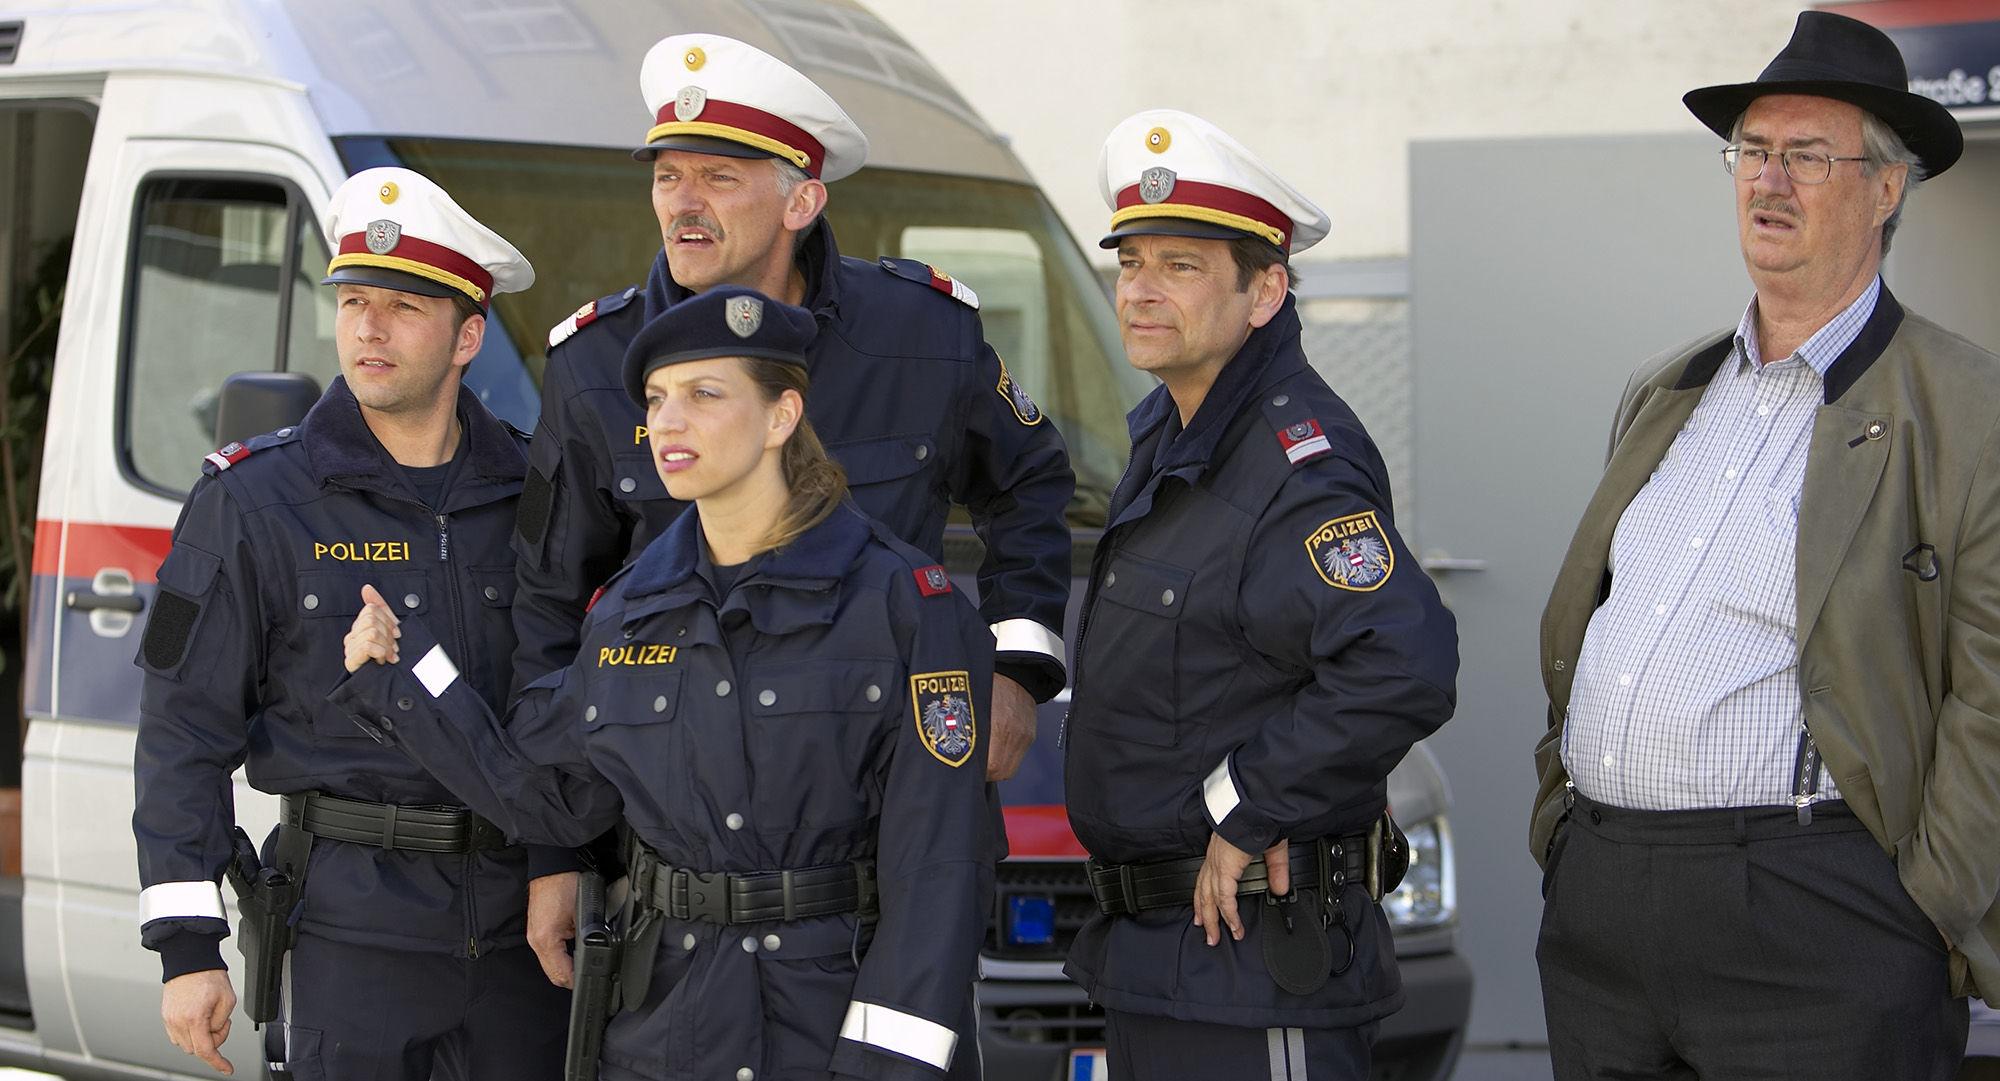 Markus Reisenberger (Ronald Wührer), Manfred Dungl (Traugott Pimpf), Martina Schwab (Arabella Hürner), Andreas Steppan (August Horrowitz), Gerhard Zemann  (Chefinspektor Zirmgiebel)